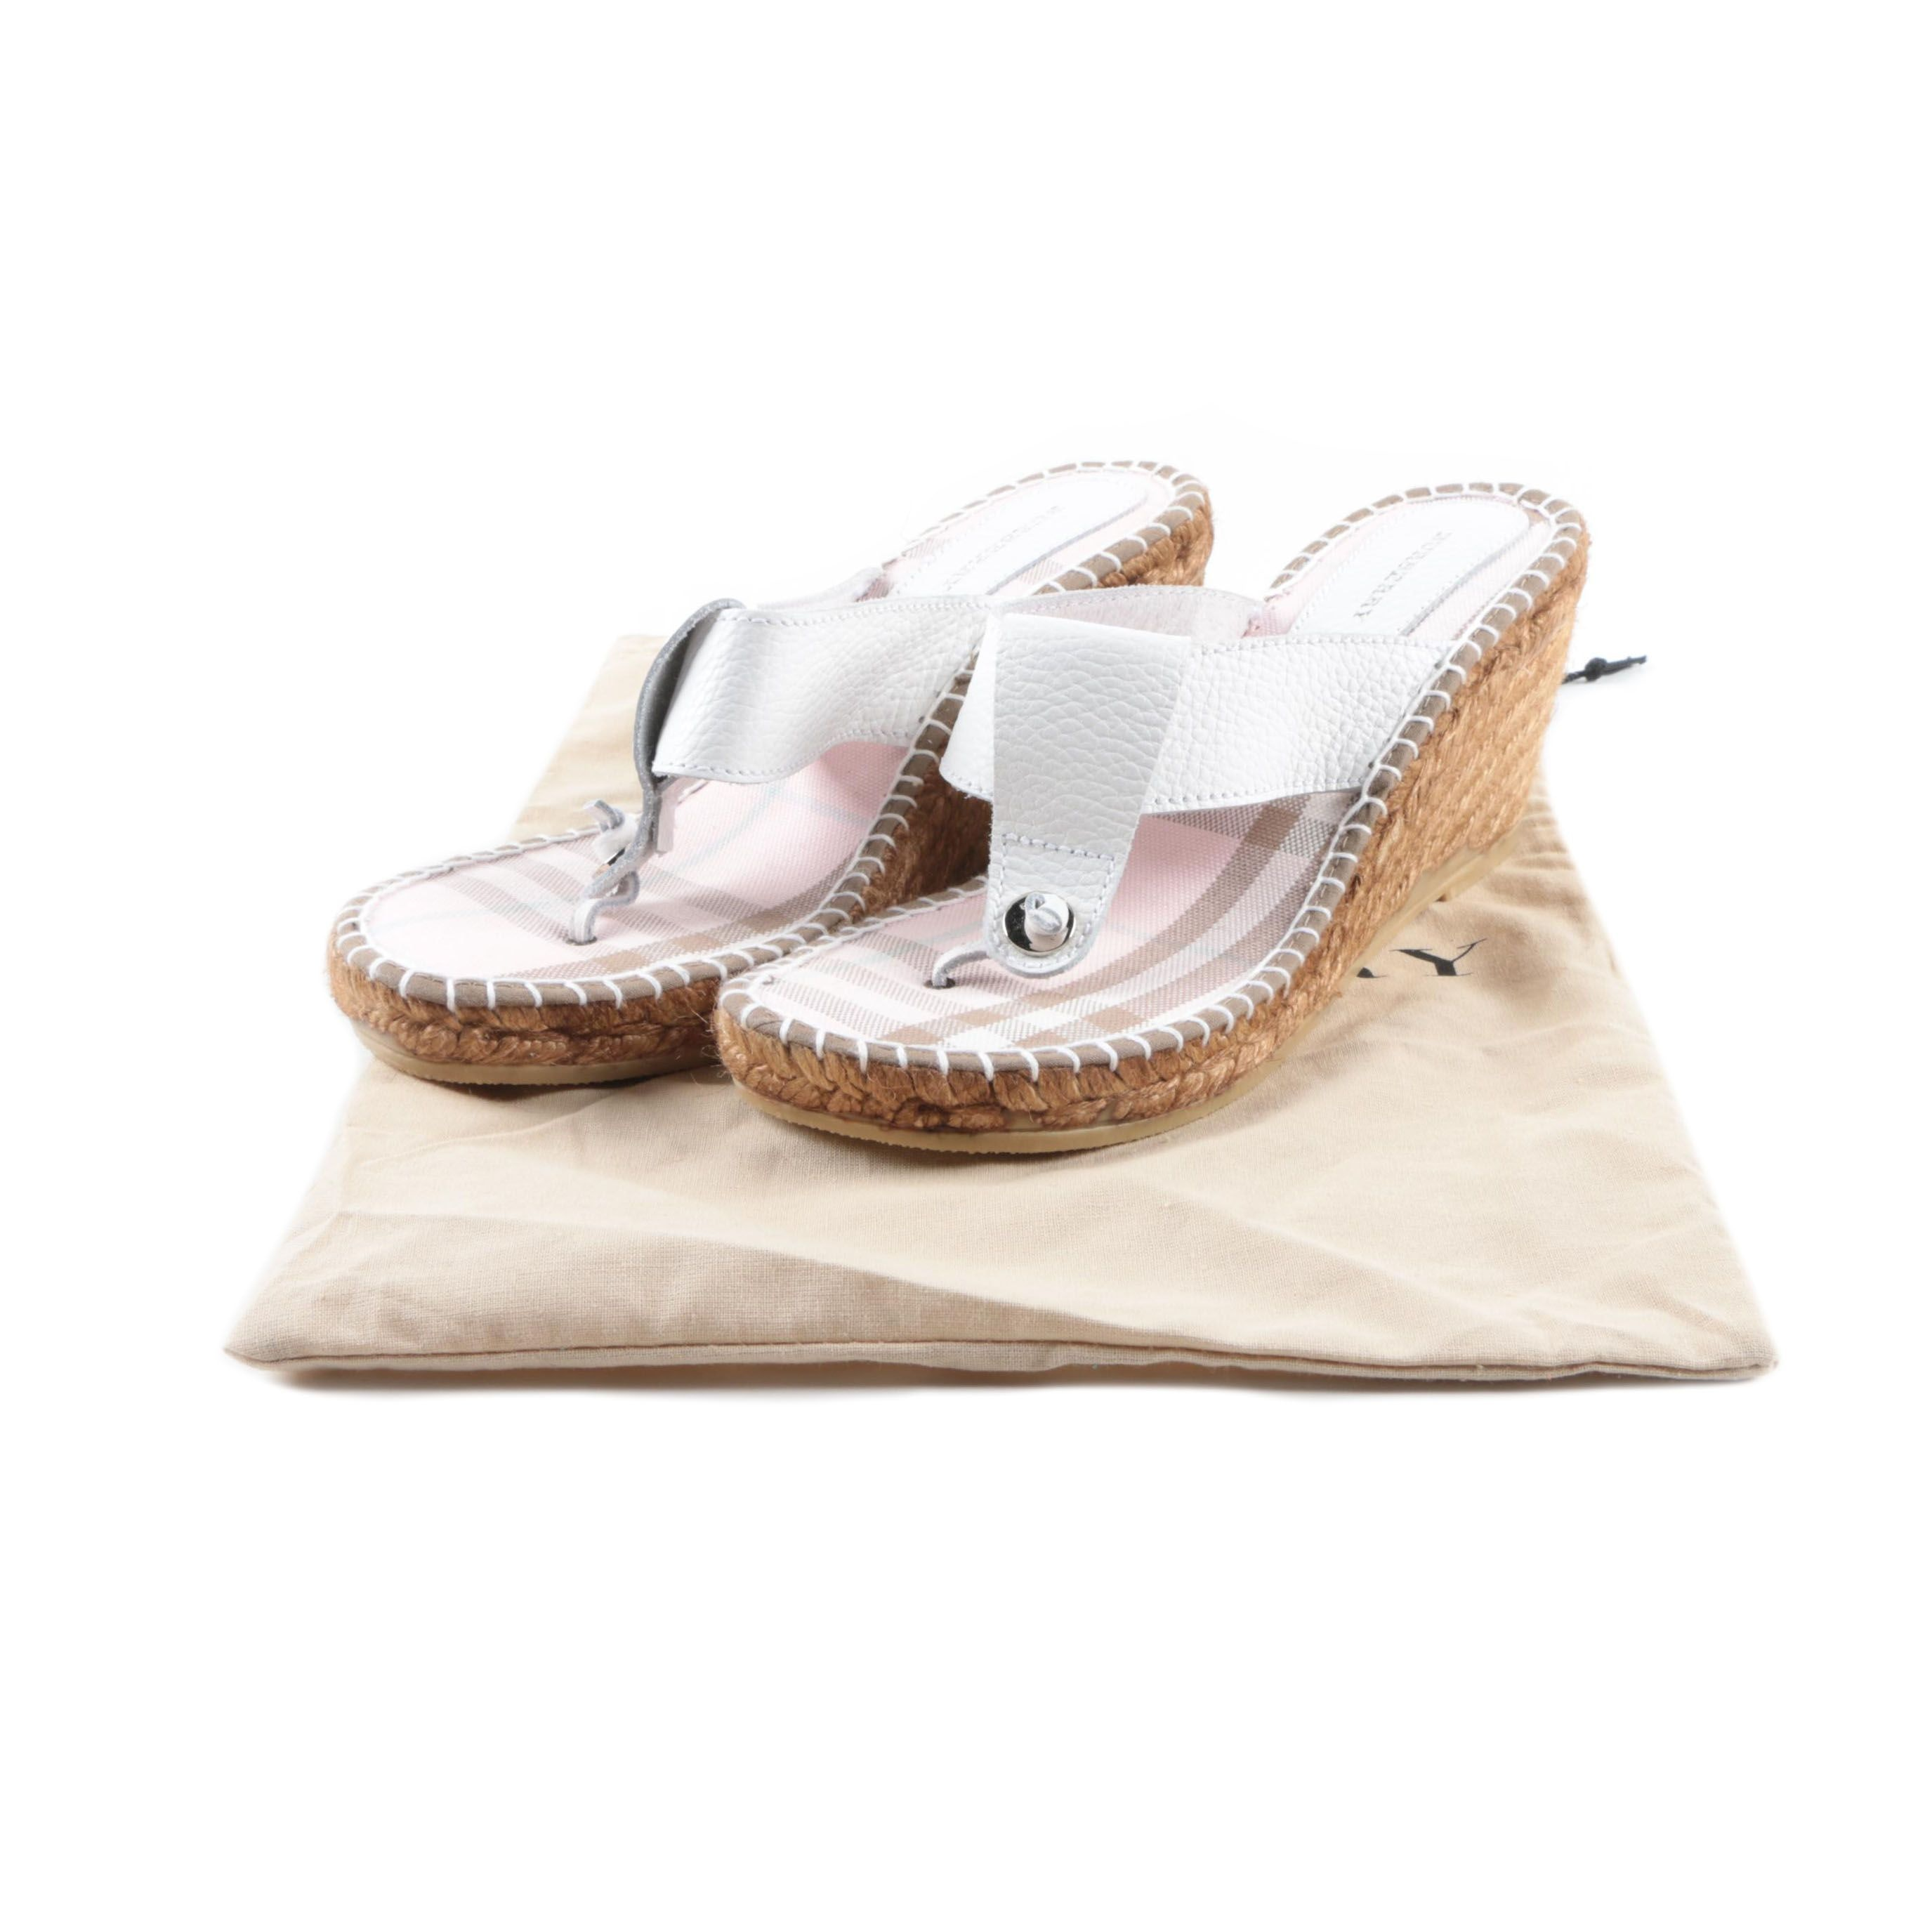 Burberry Espadrille Wedge Sandals